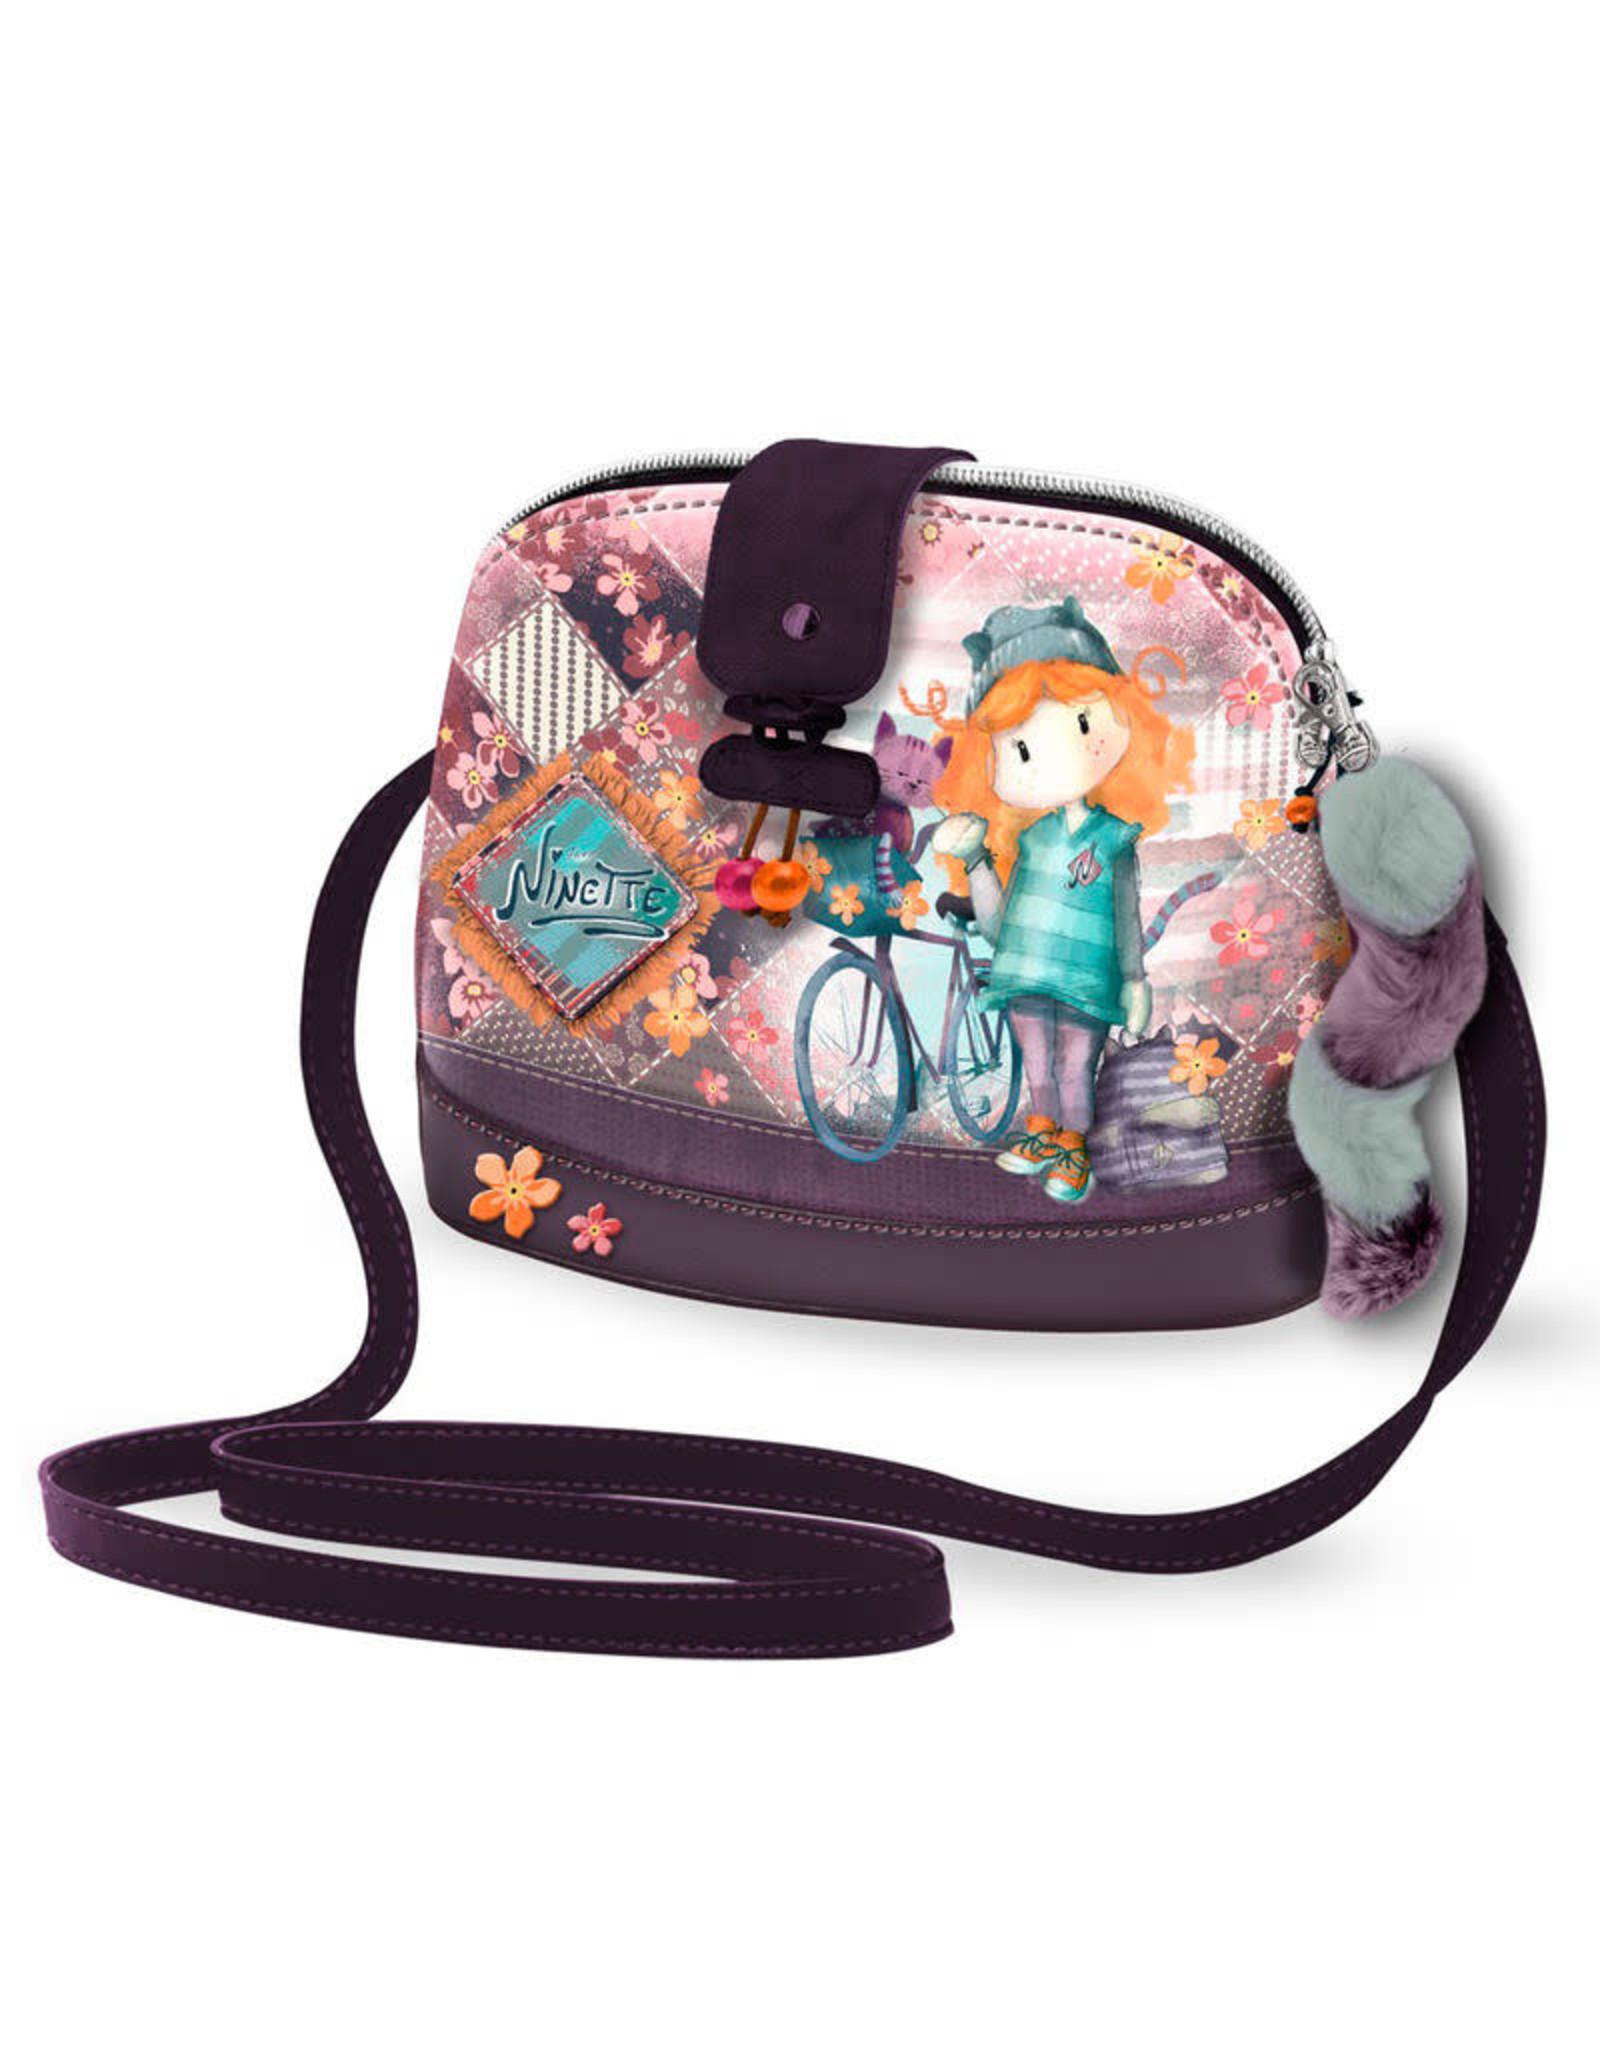 NINETTE Crossbody bag - Bicycle